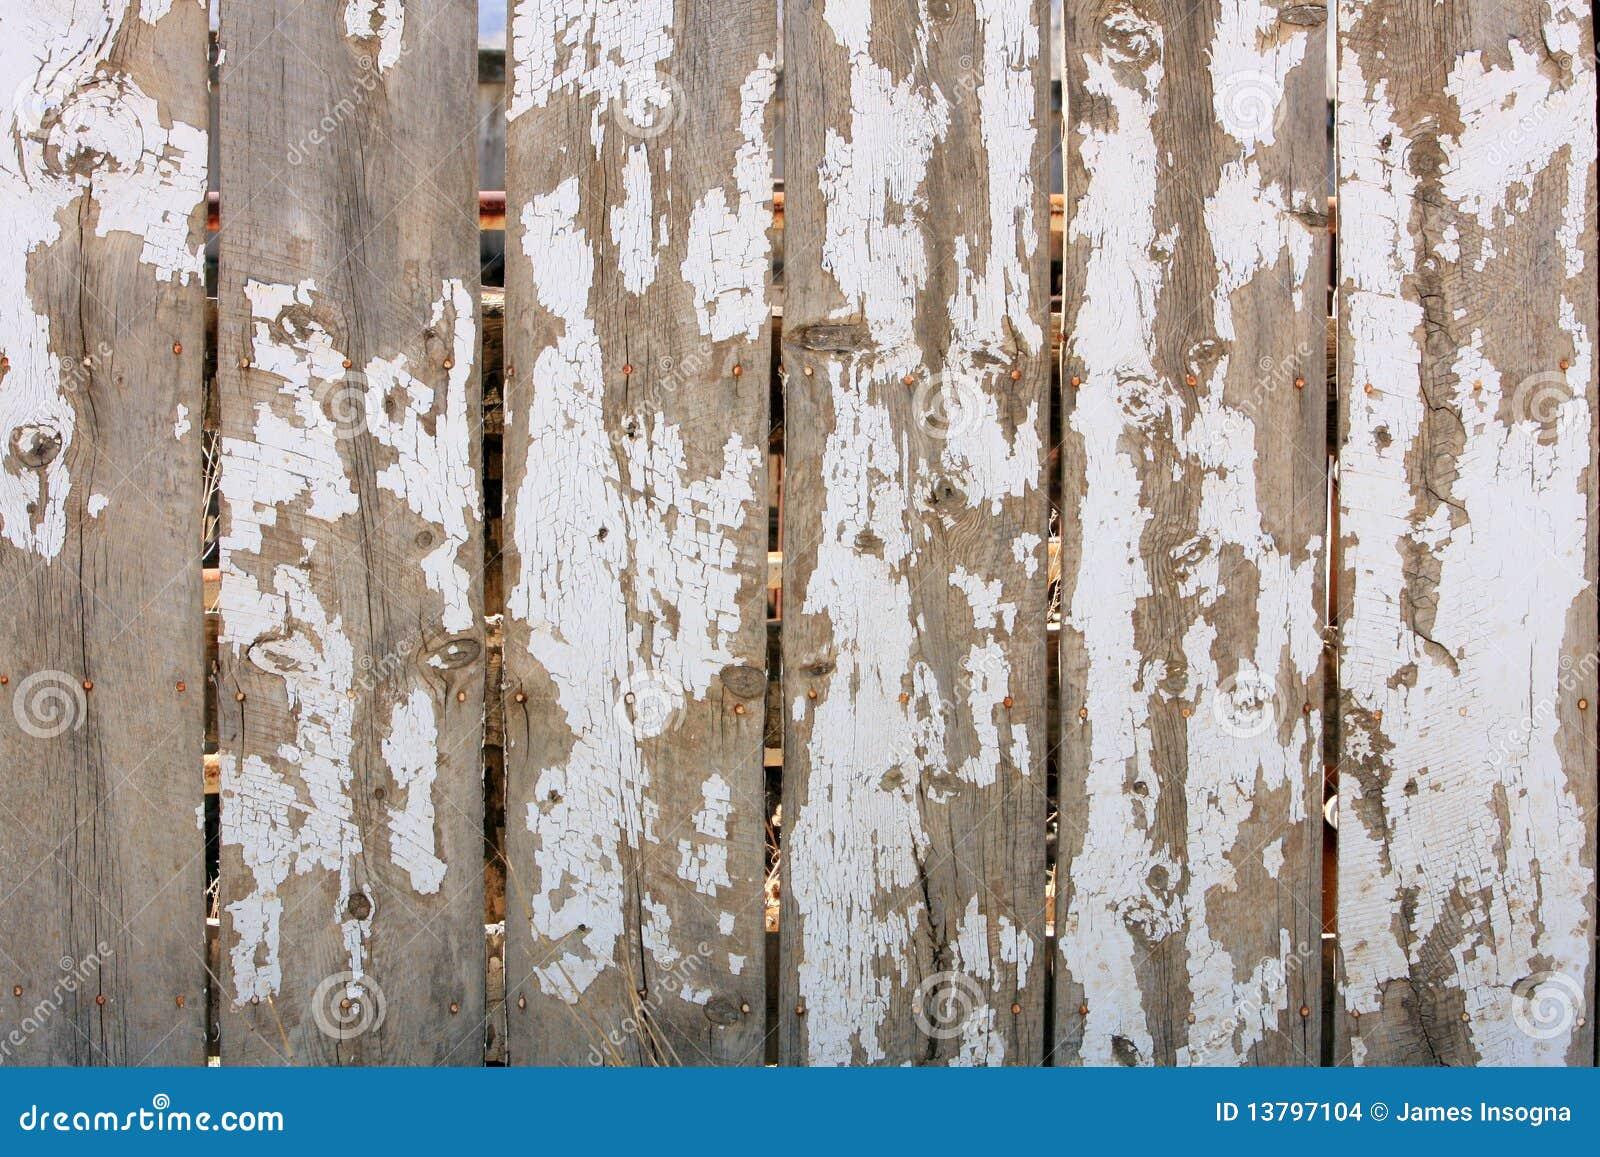 Wood Fence Shiped White Paint Texture Stock Photo Image